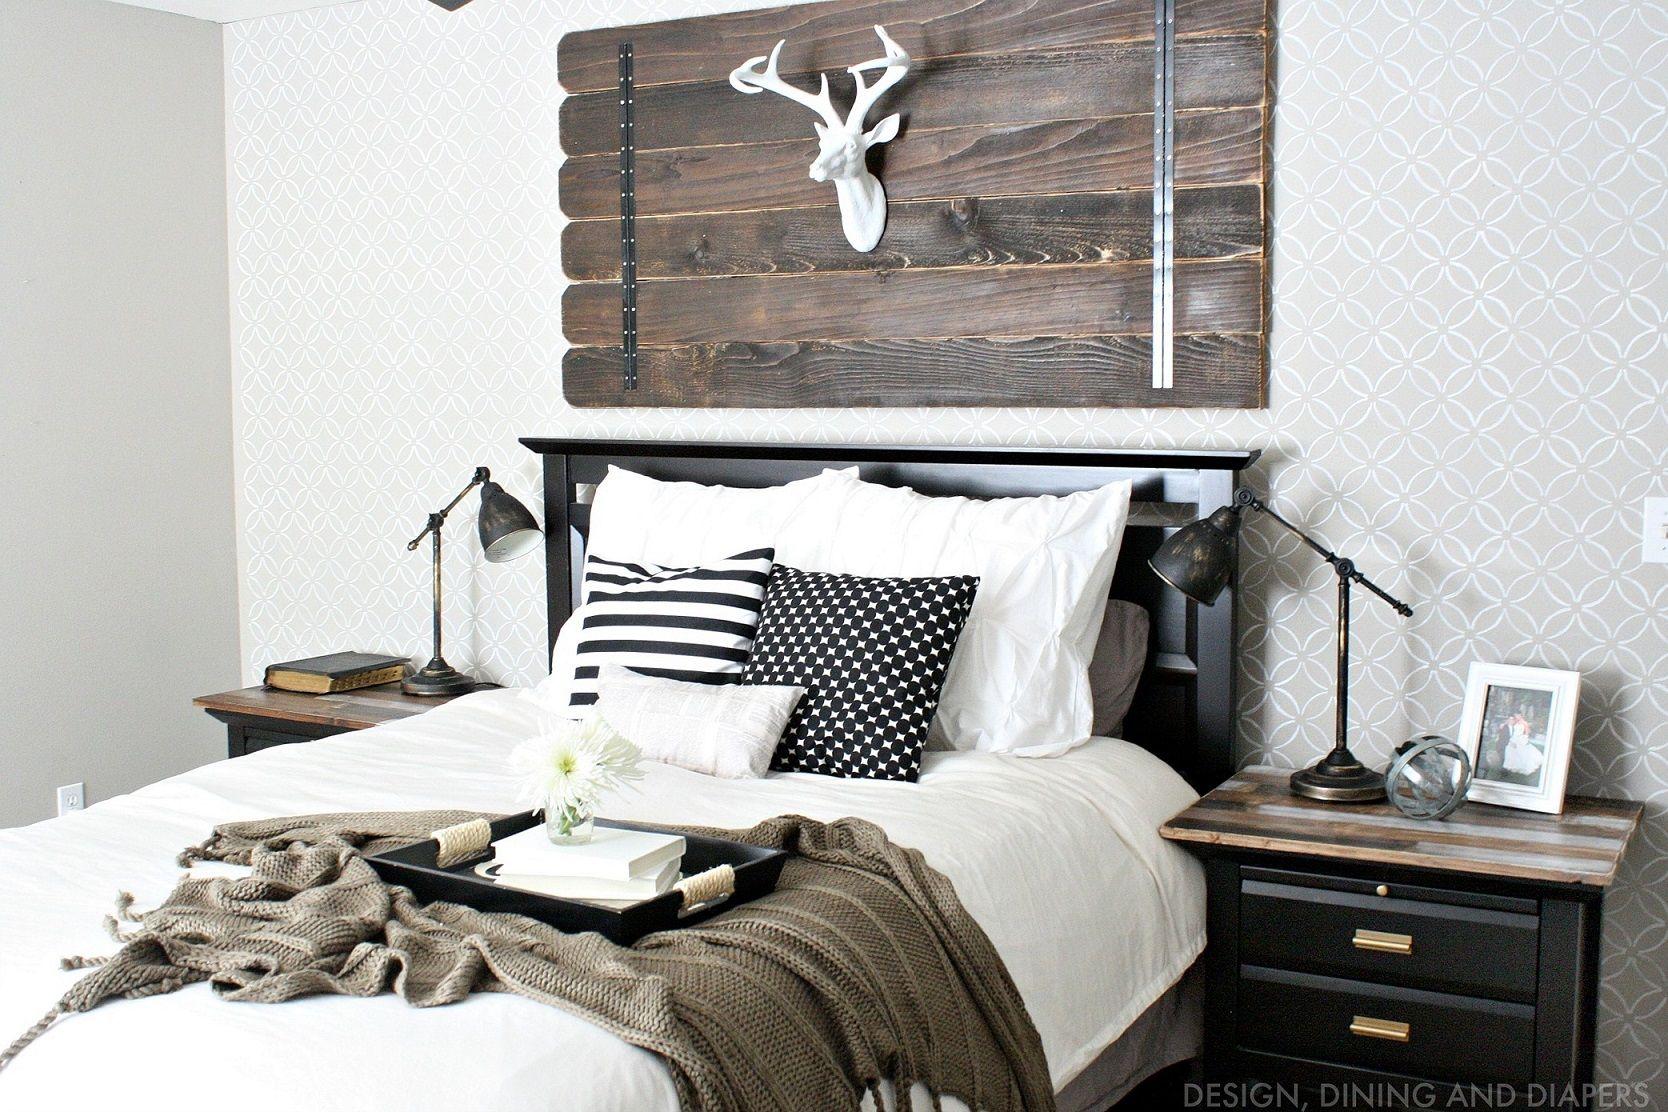 A Modern Farmhouse Bedroom, I See Wood Pedants Trims U0026u0027 White Enamel  Bedding Sheets